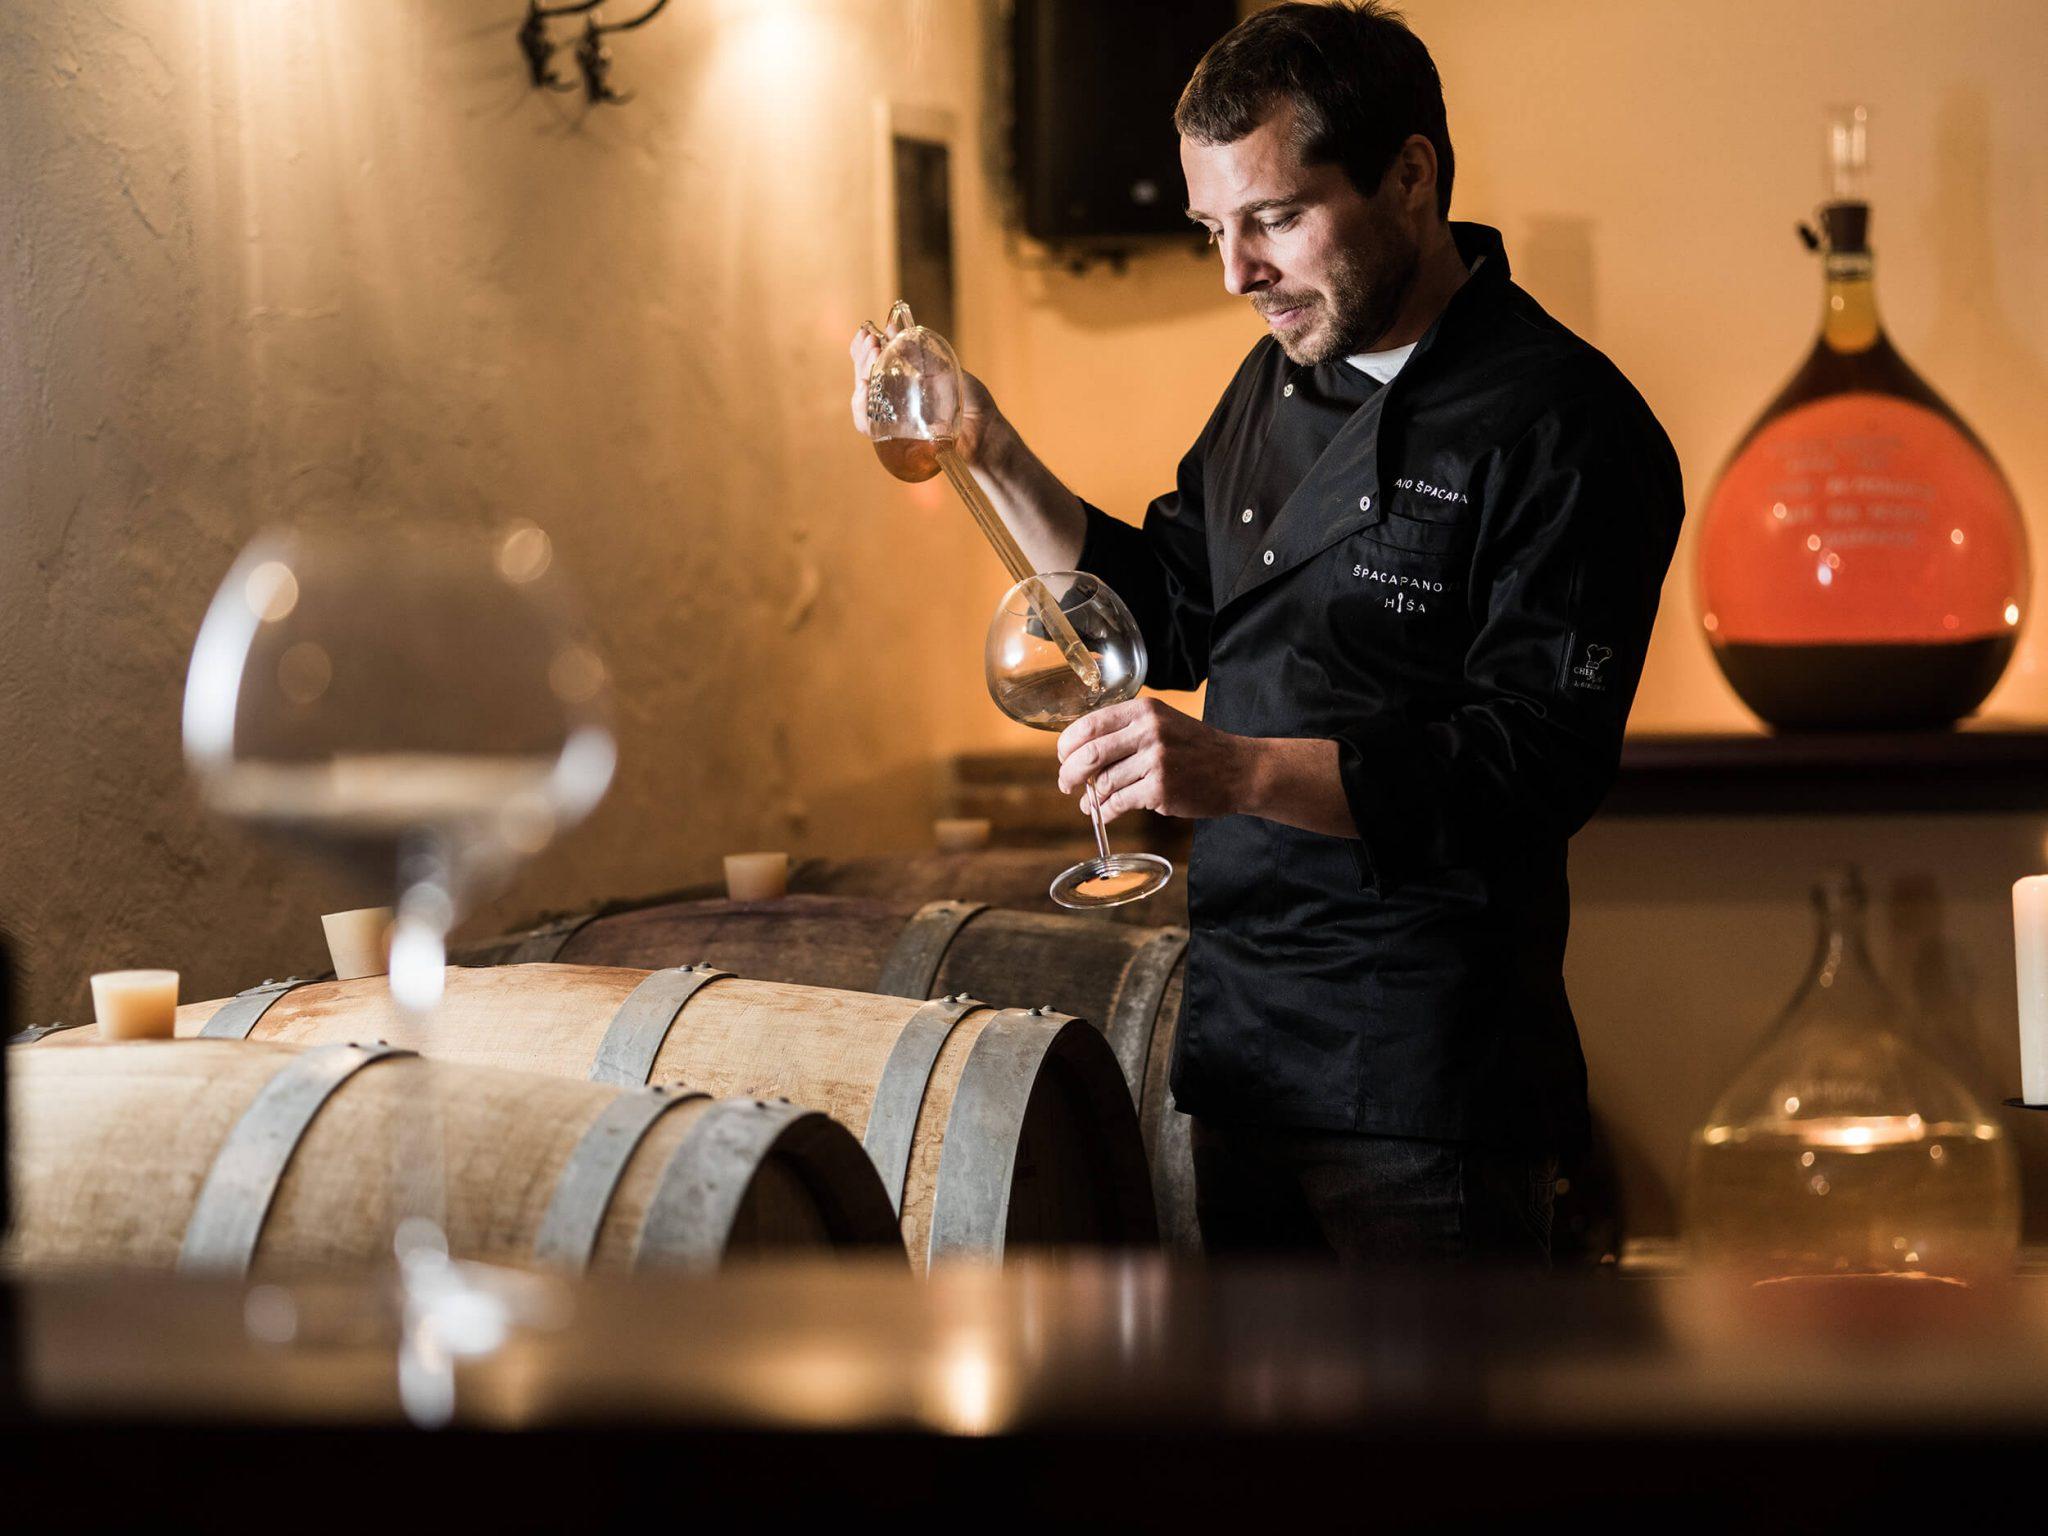 Ago Špacapan v kleti Špacapanove hiše okuša domače vino